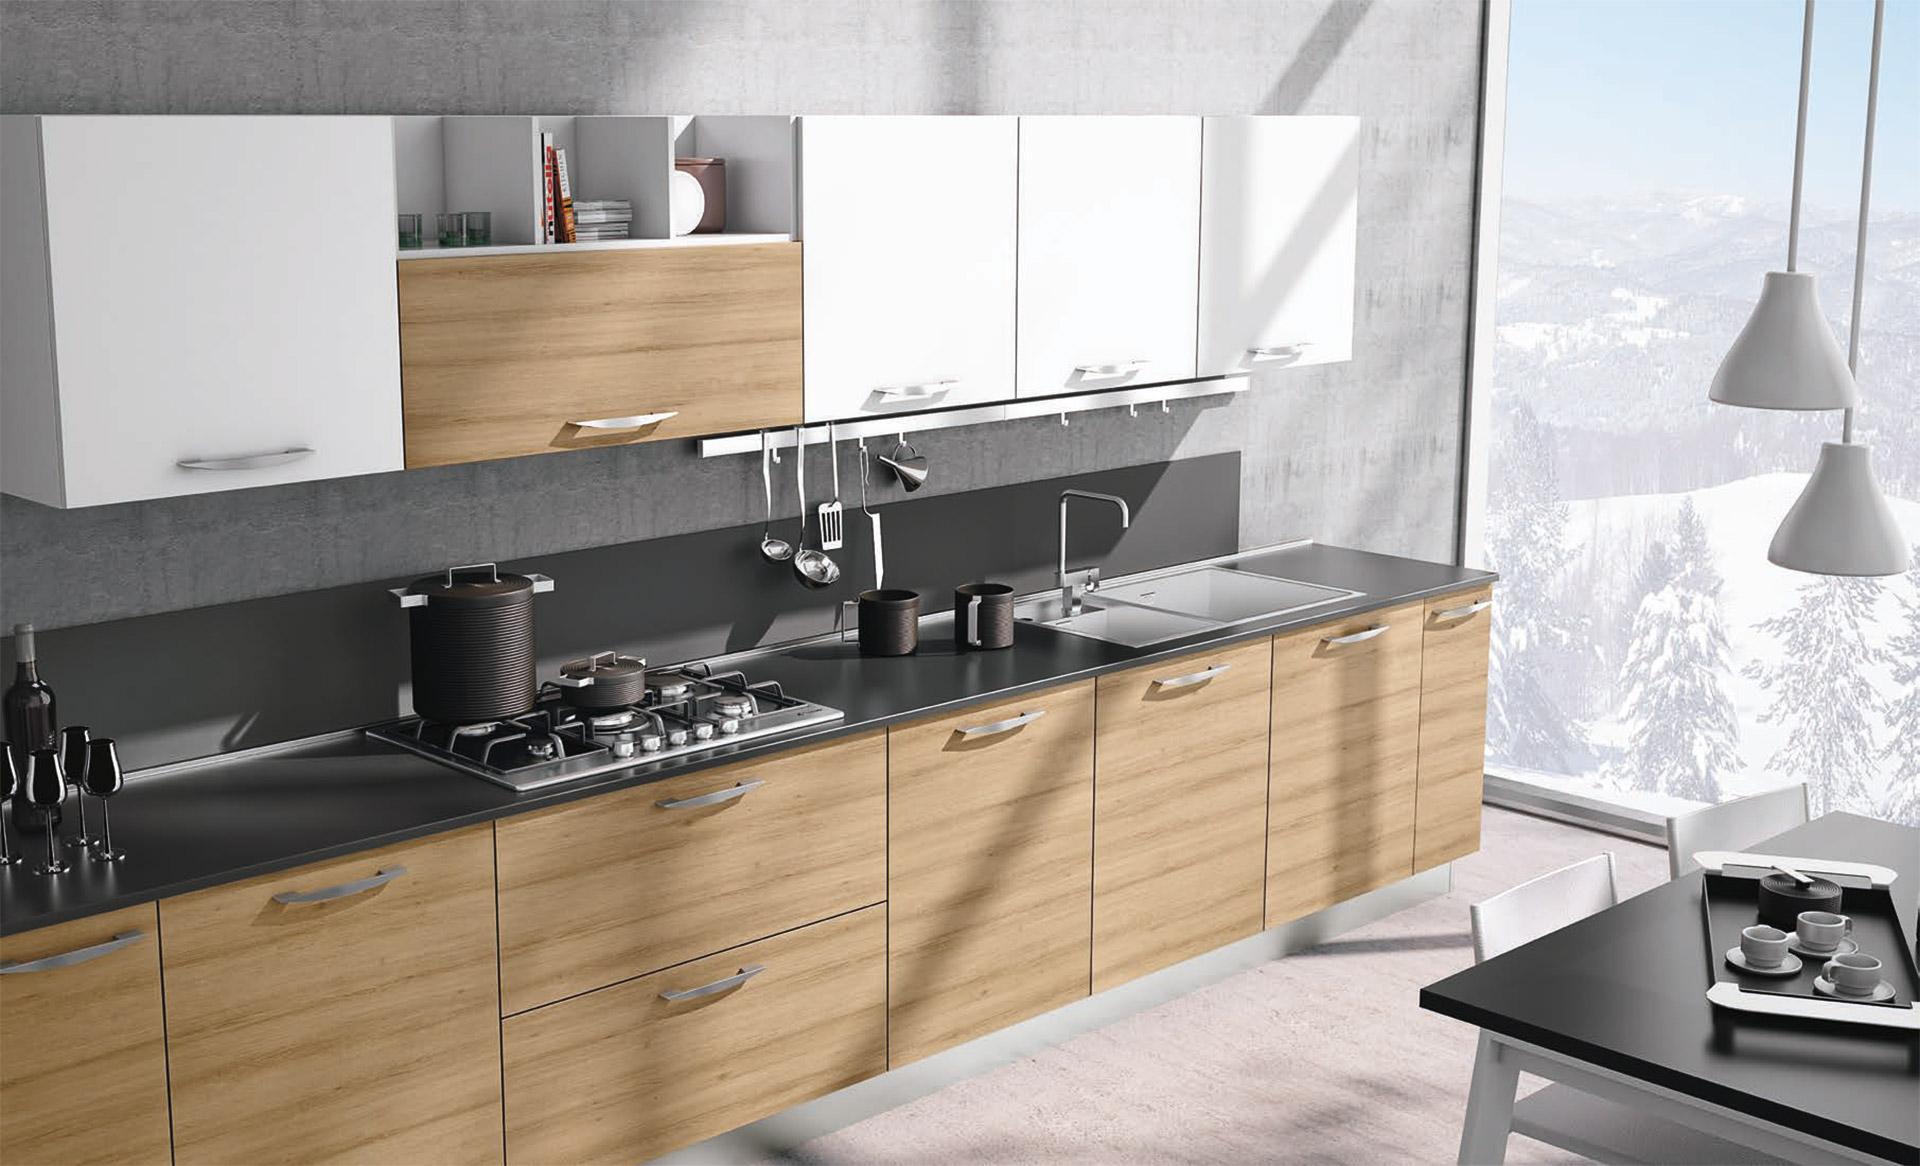 Cucine Creo Lube Opinioni cucina britt - cucine moderne - creo kitchens